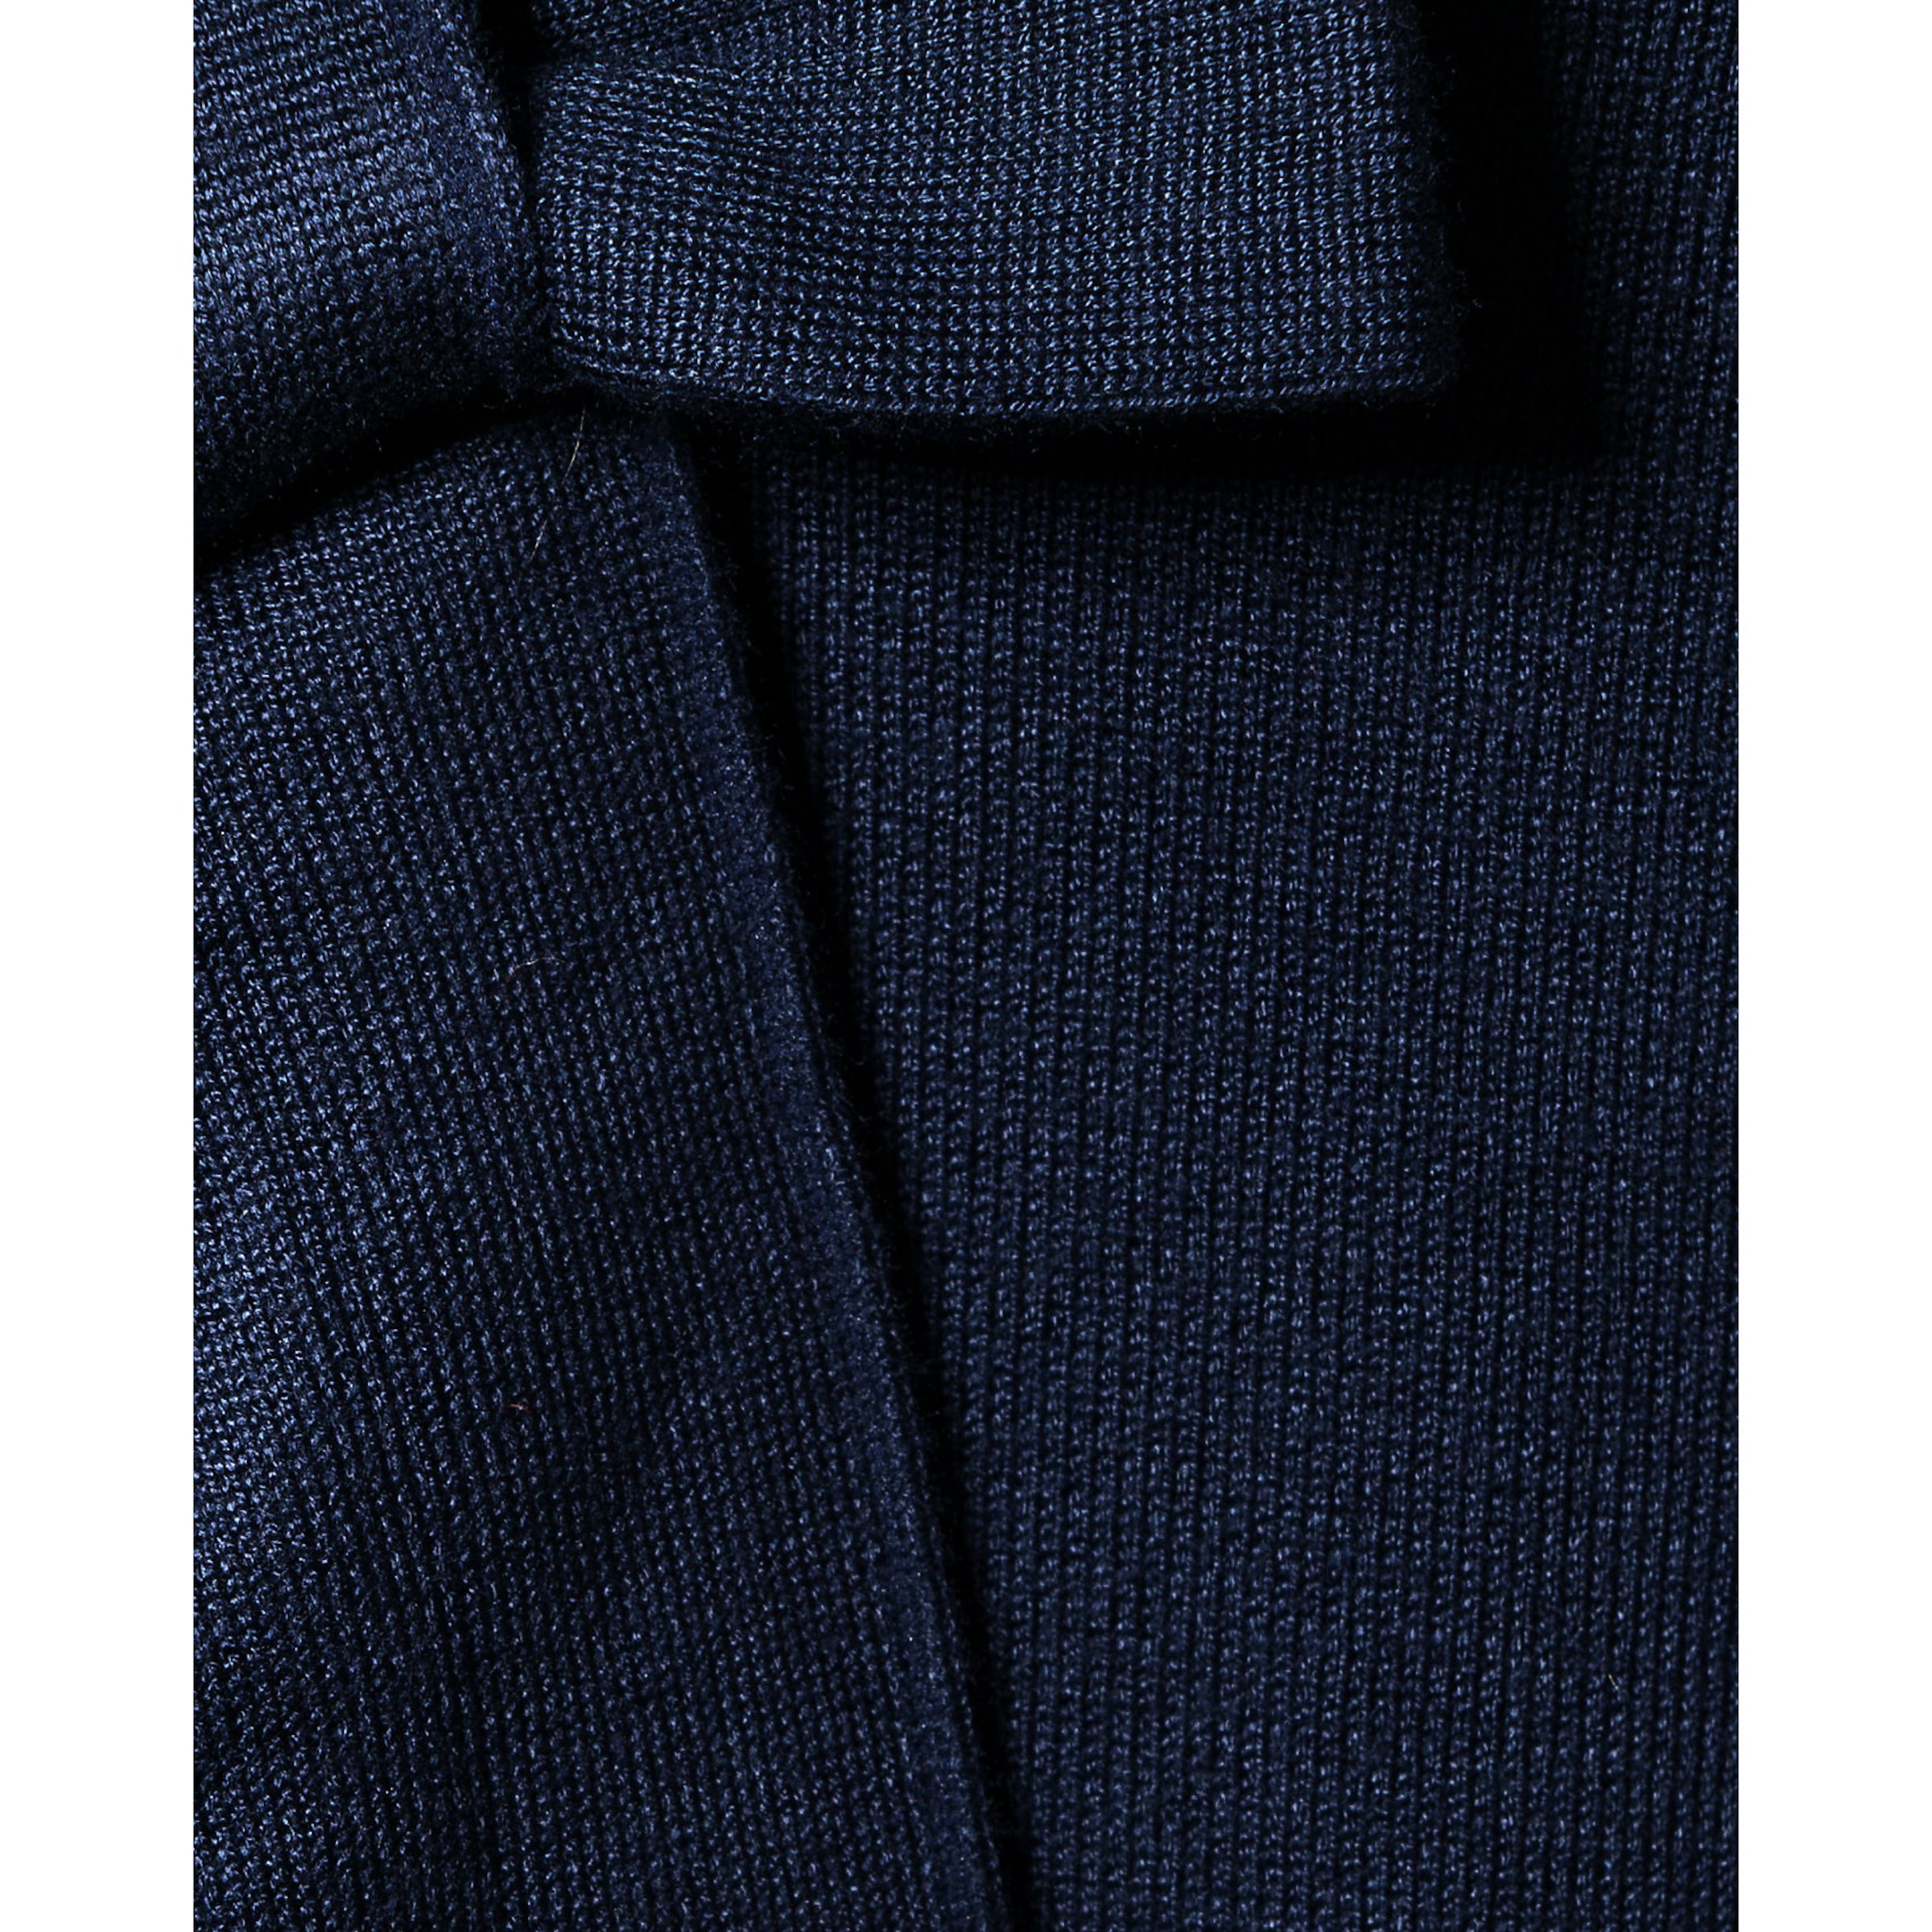 Nachtblau Colline In Colline Pullover In Nachtblau Colline In Pullover Pullover Colline Nachtblau IYfm6gbv7y